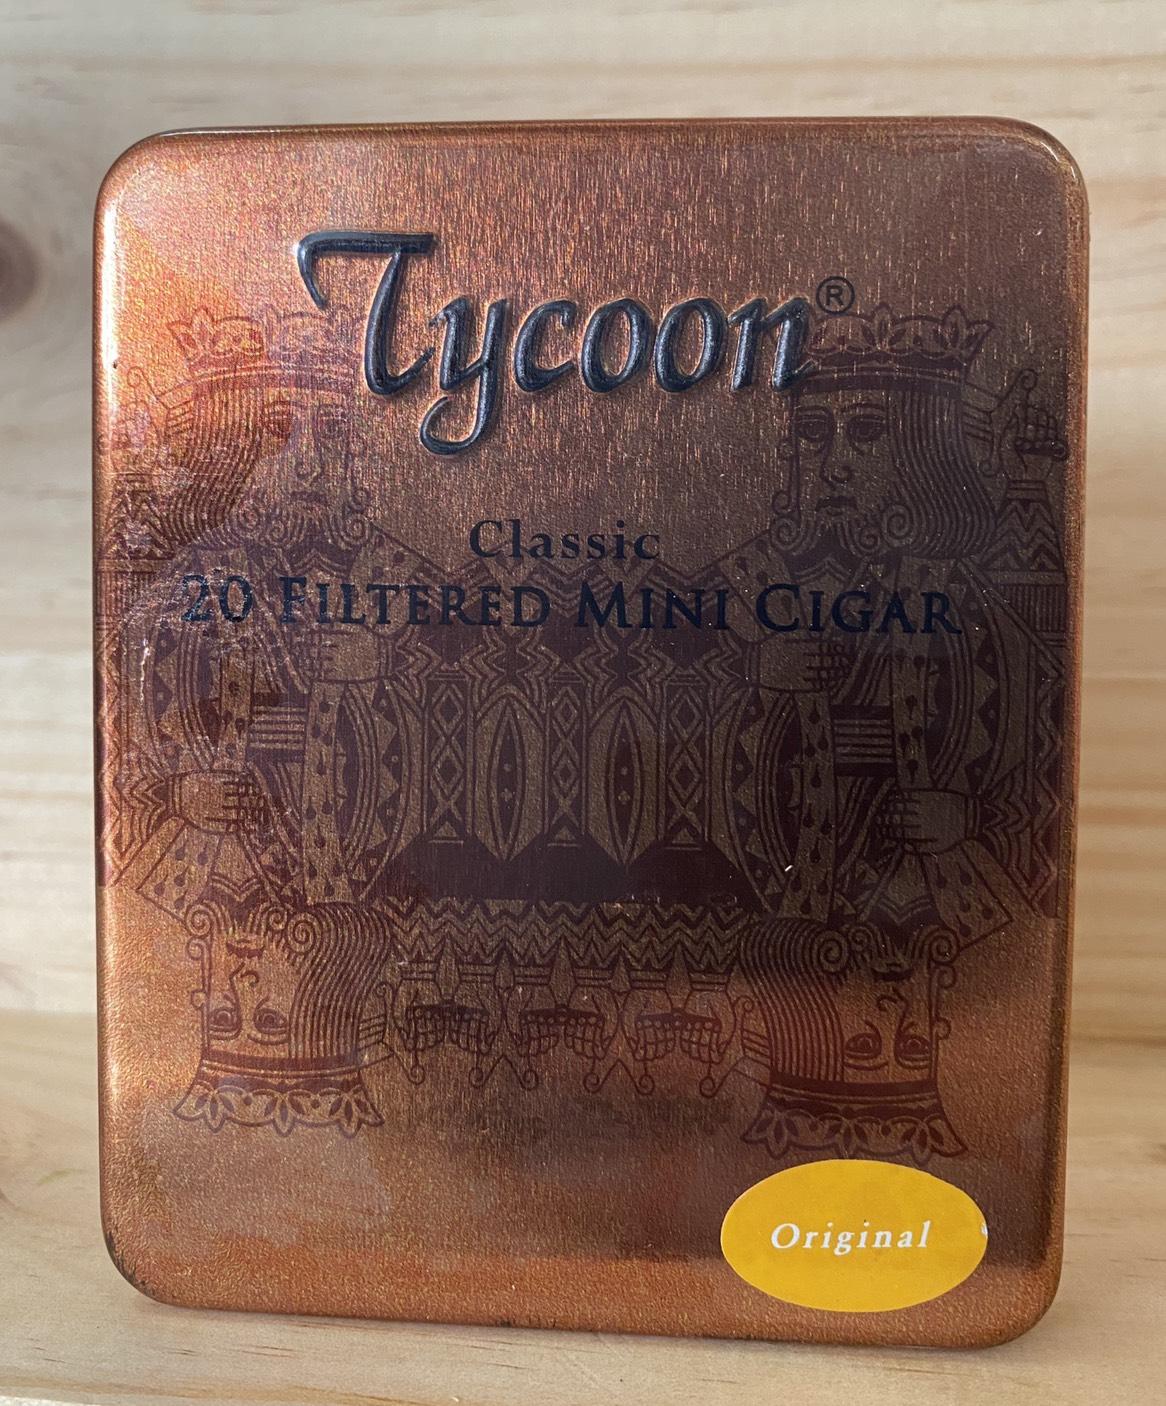 Tycoon Original (Mini Cigar)